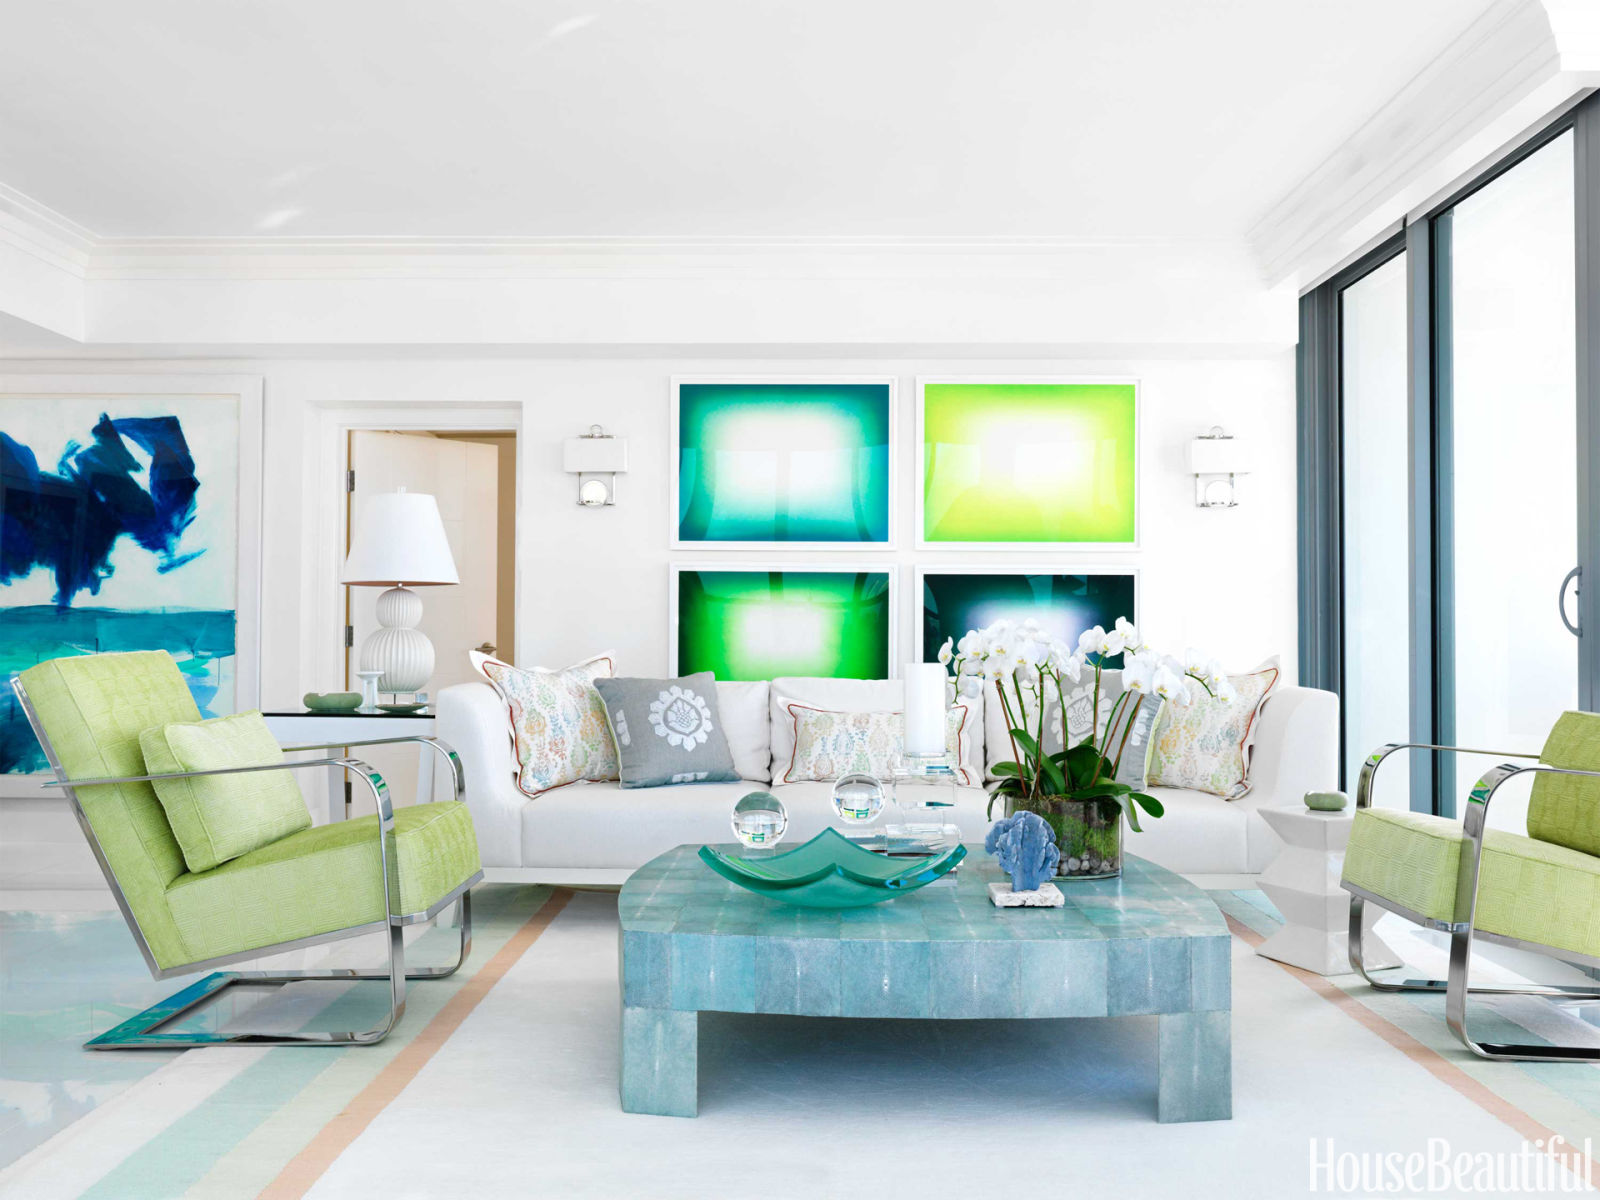 50 Best Living Room Design Ideas For 2017 Part 56